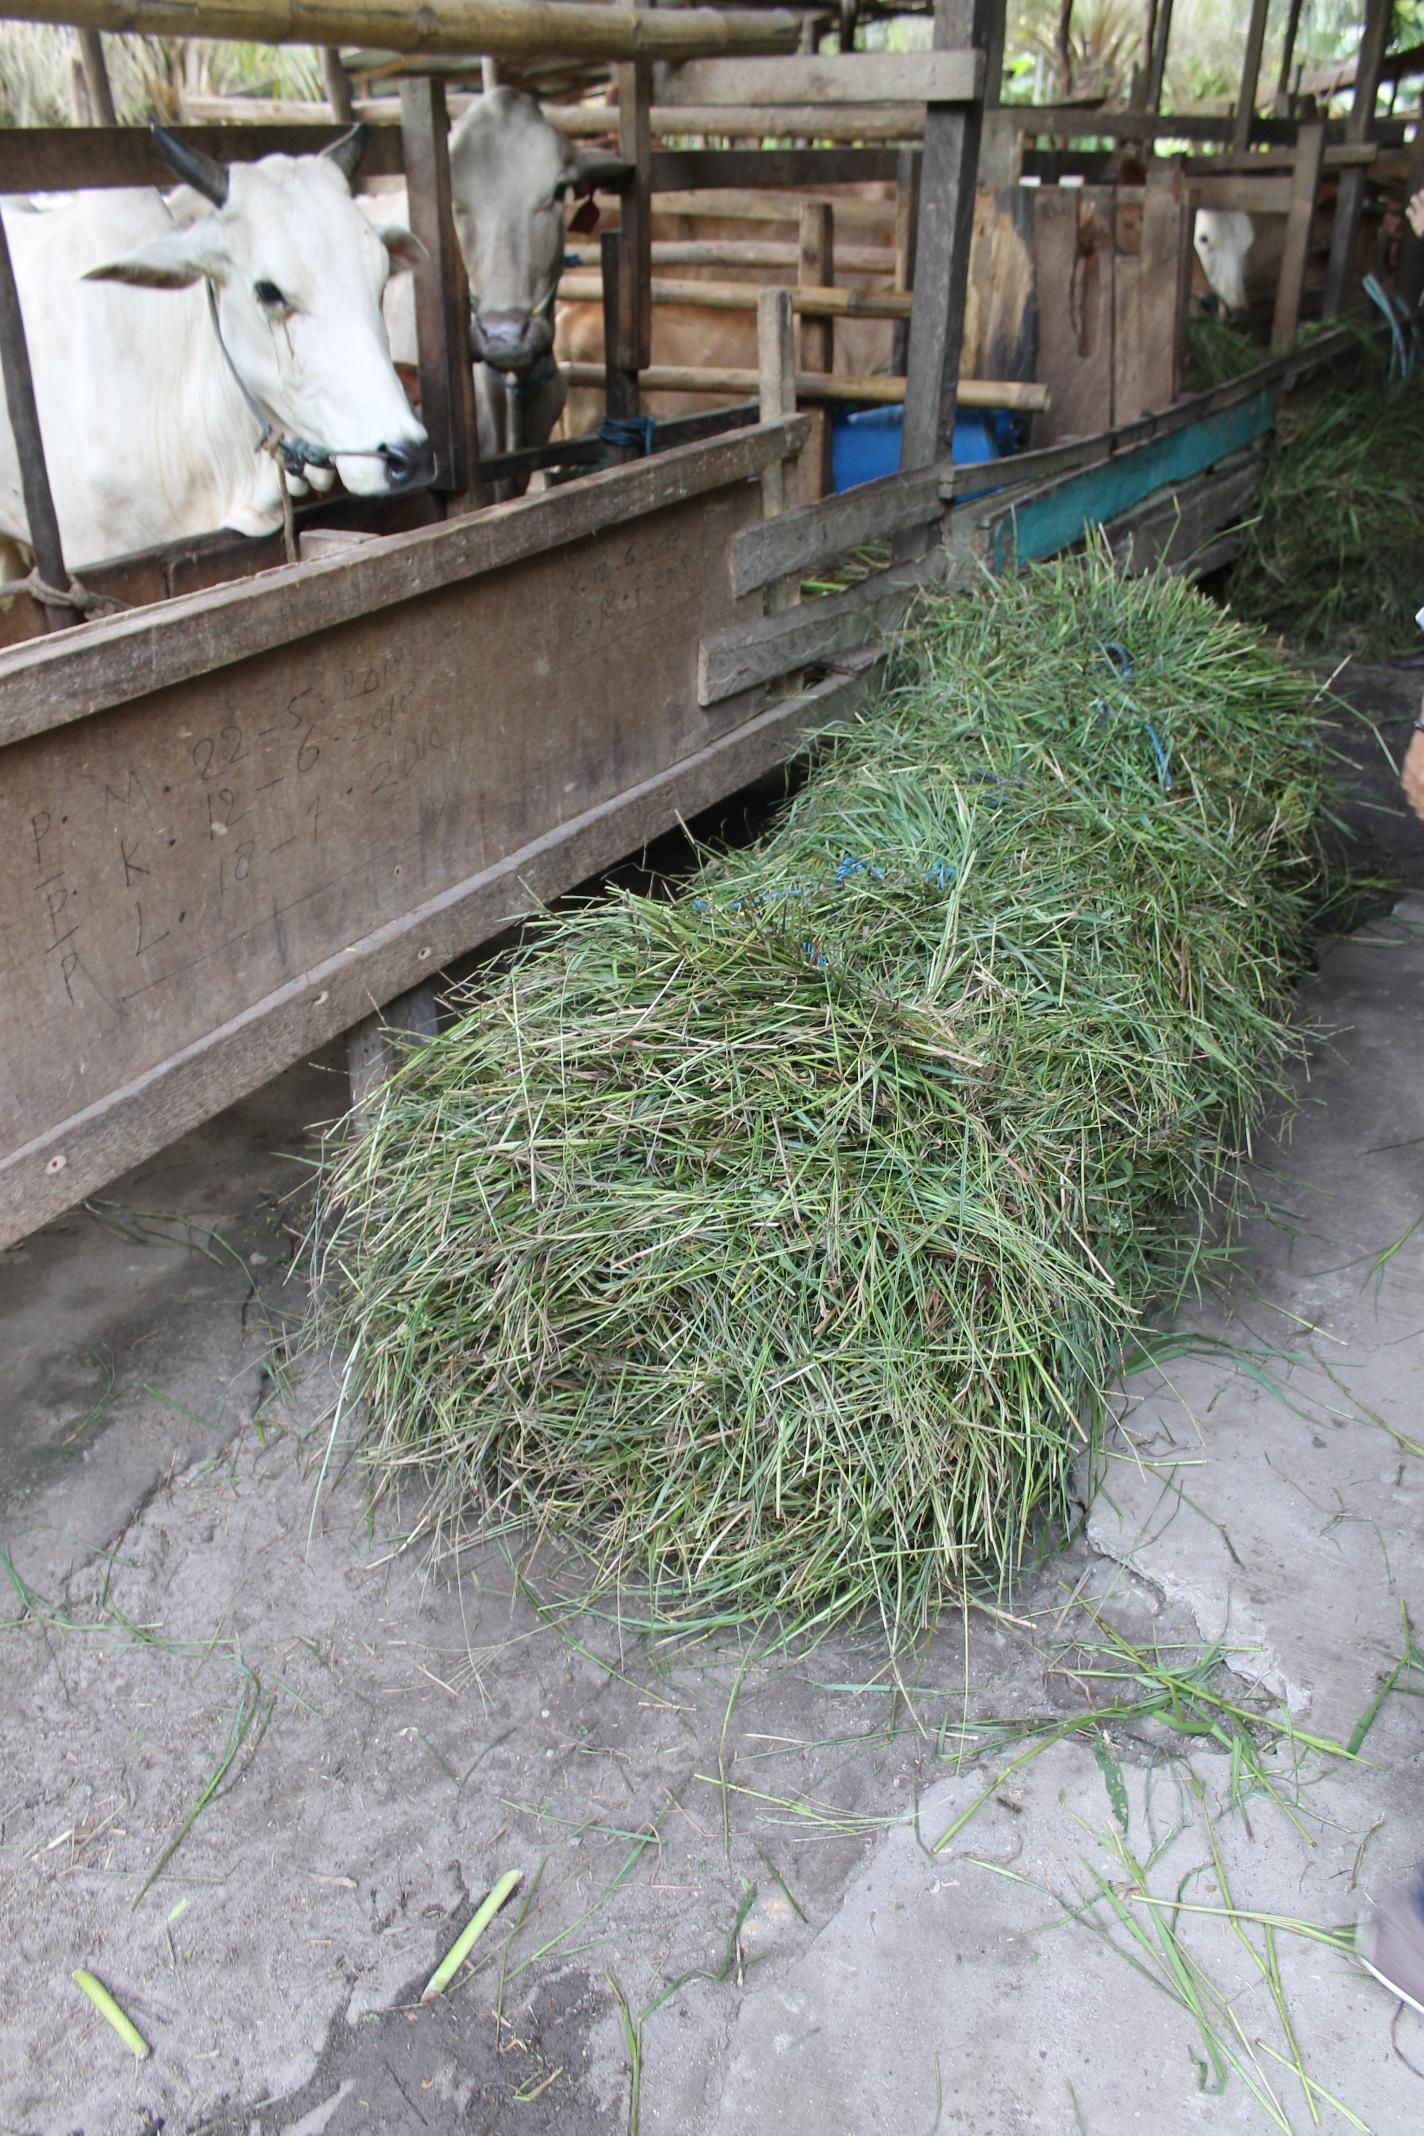 Cut and carry feed rolls transported by motorbike, Mekar Jaya village, East Kalimantan.